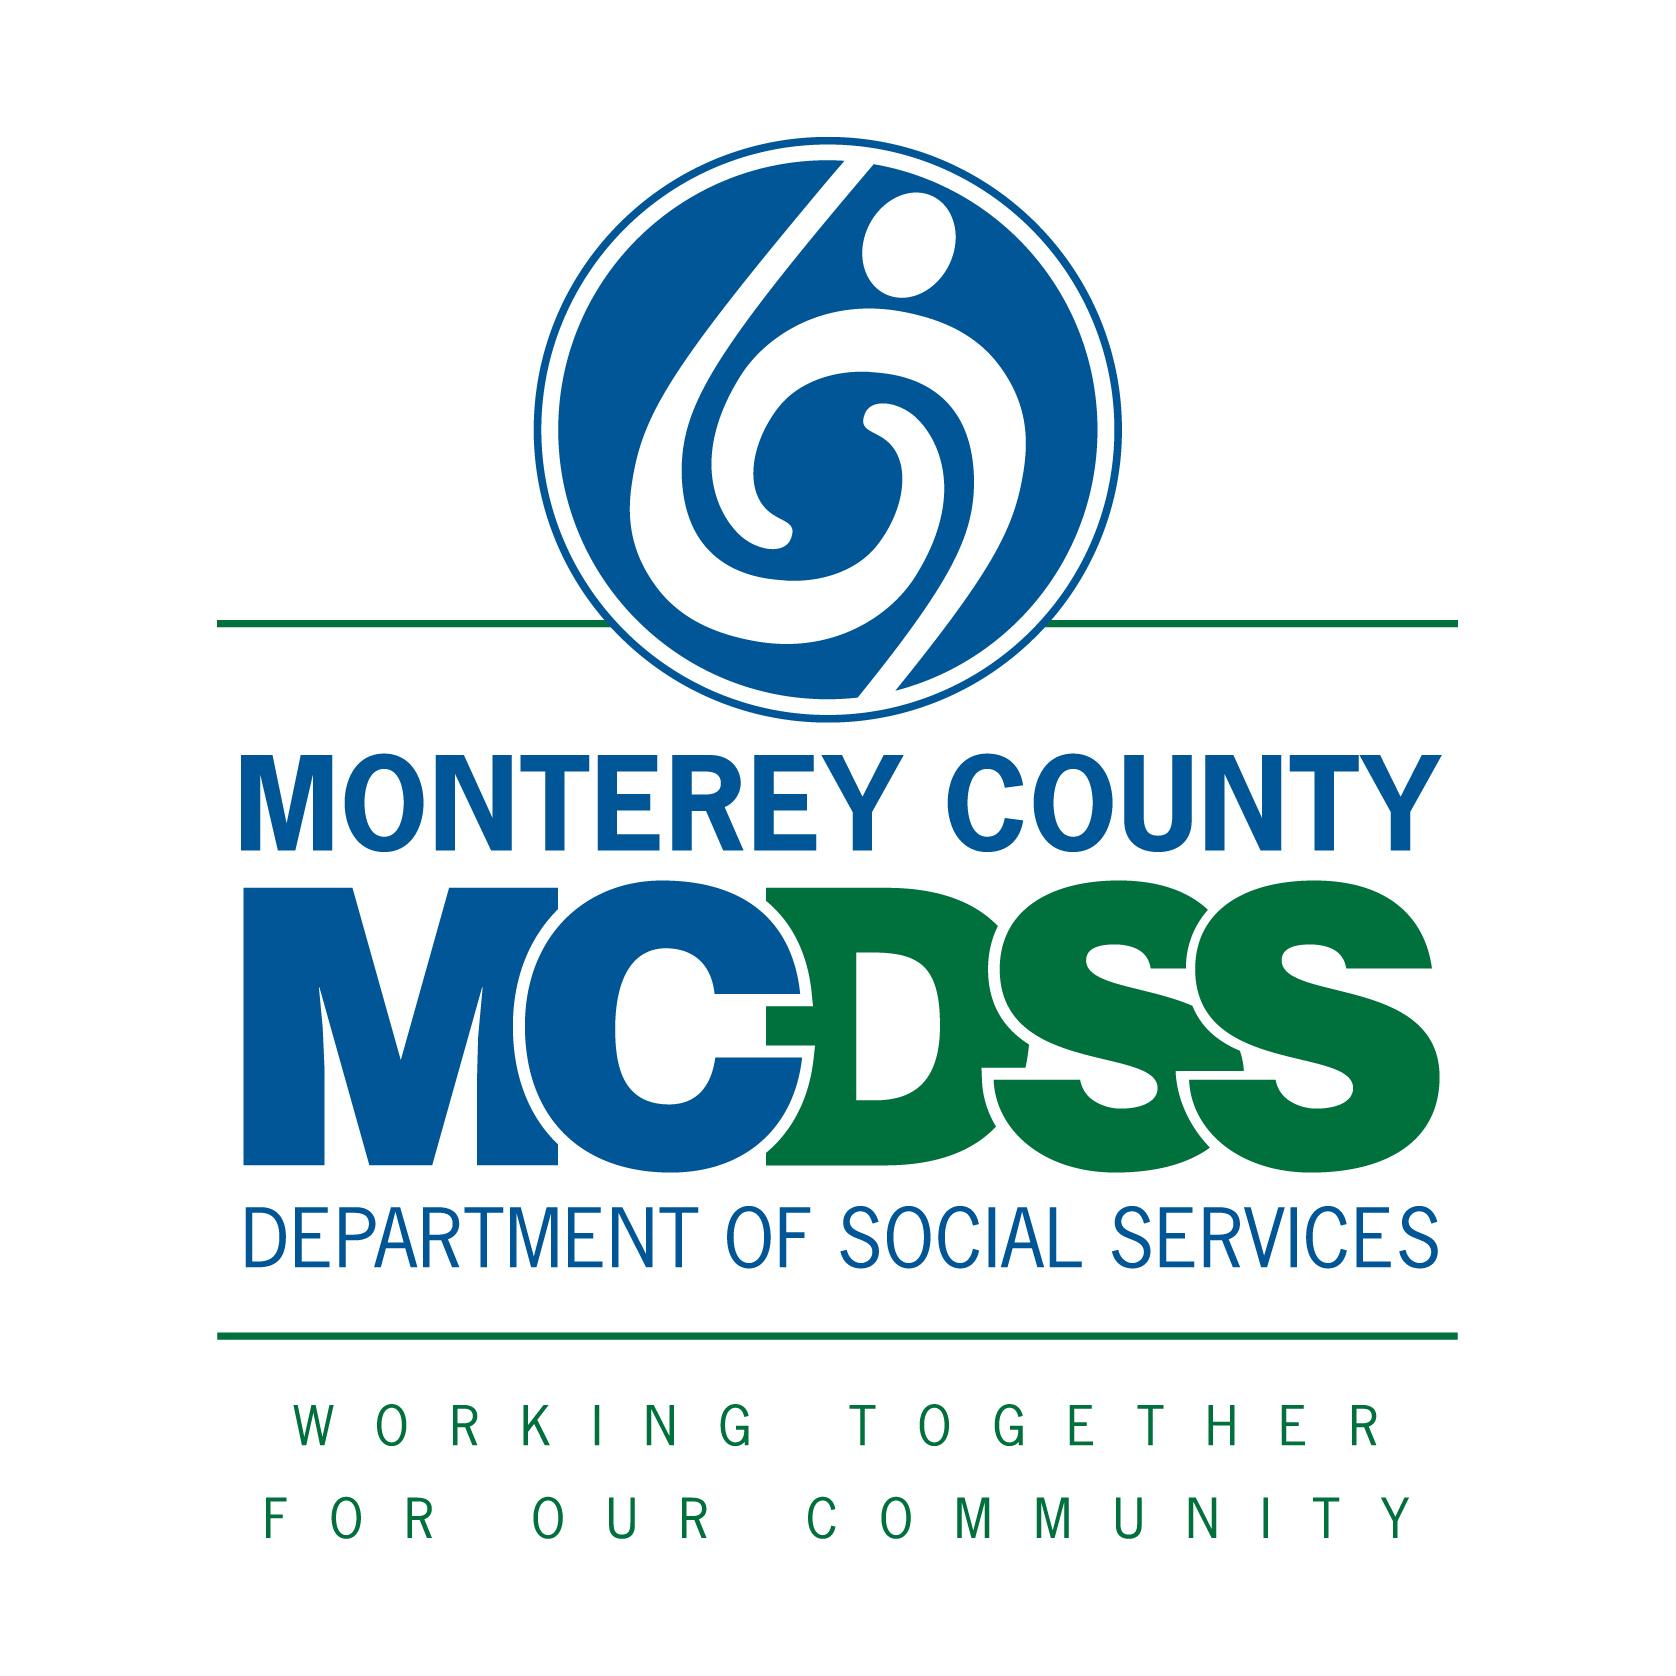 Mcdss color vert 2013+%282%29+%282%29